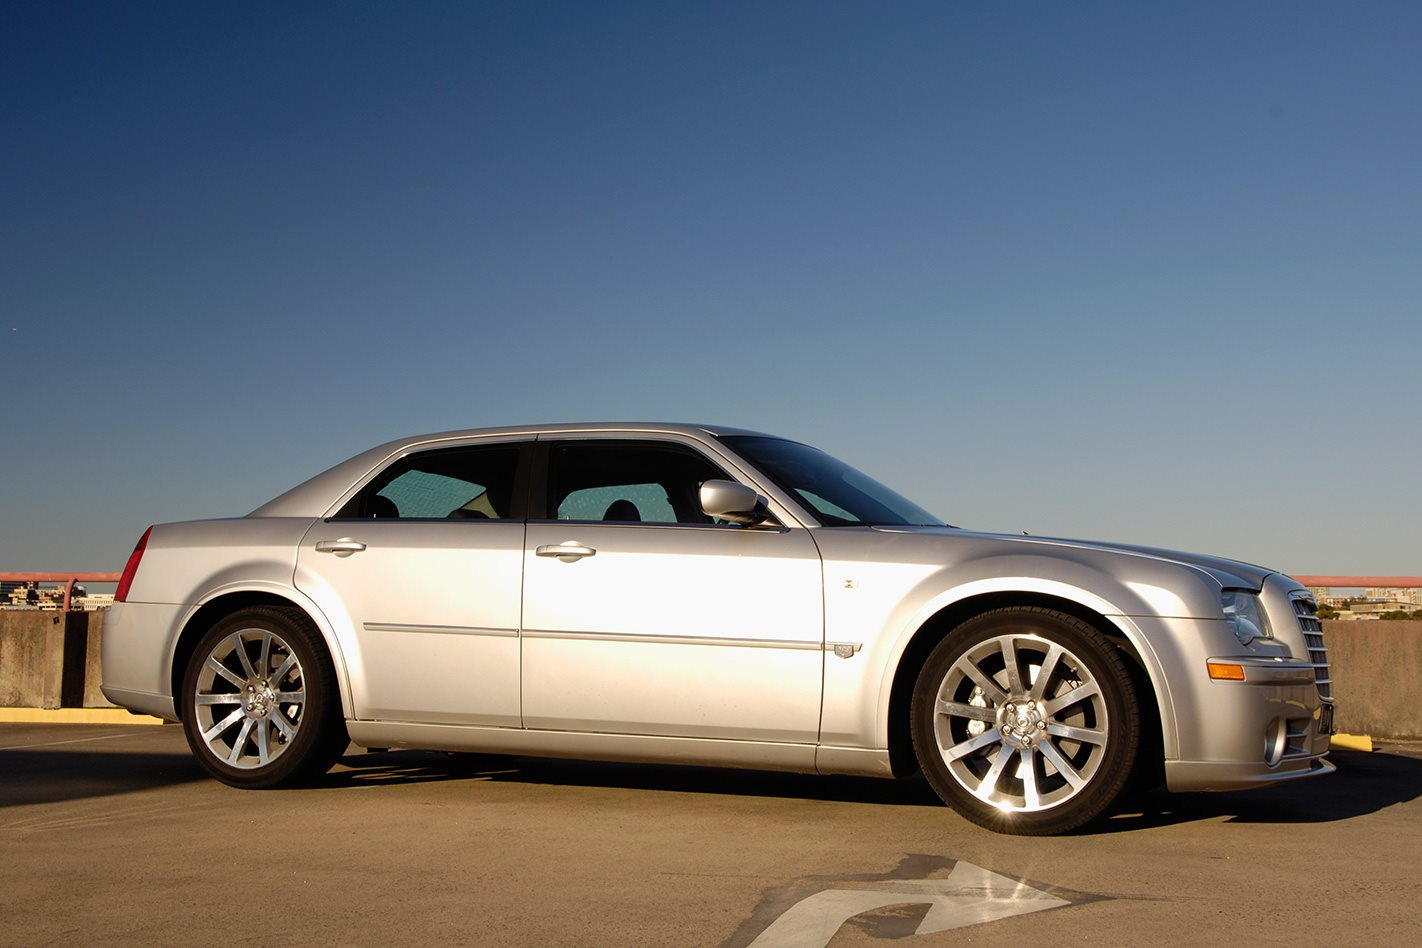 Chrysler 300c300srt8 Project Car Buyer's Guide. Chrysler 300c. Chrysler. 2007 Chrysler 300c Hemi Ecm Wiring At Scoala.co